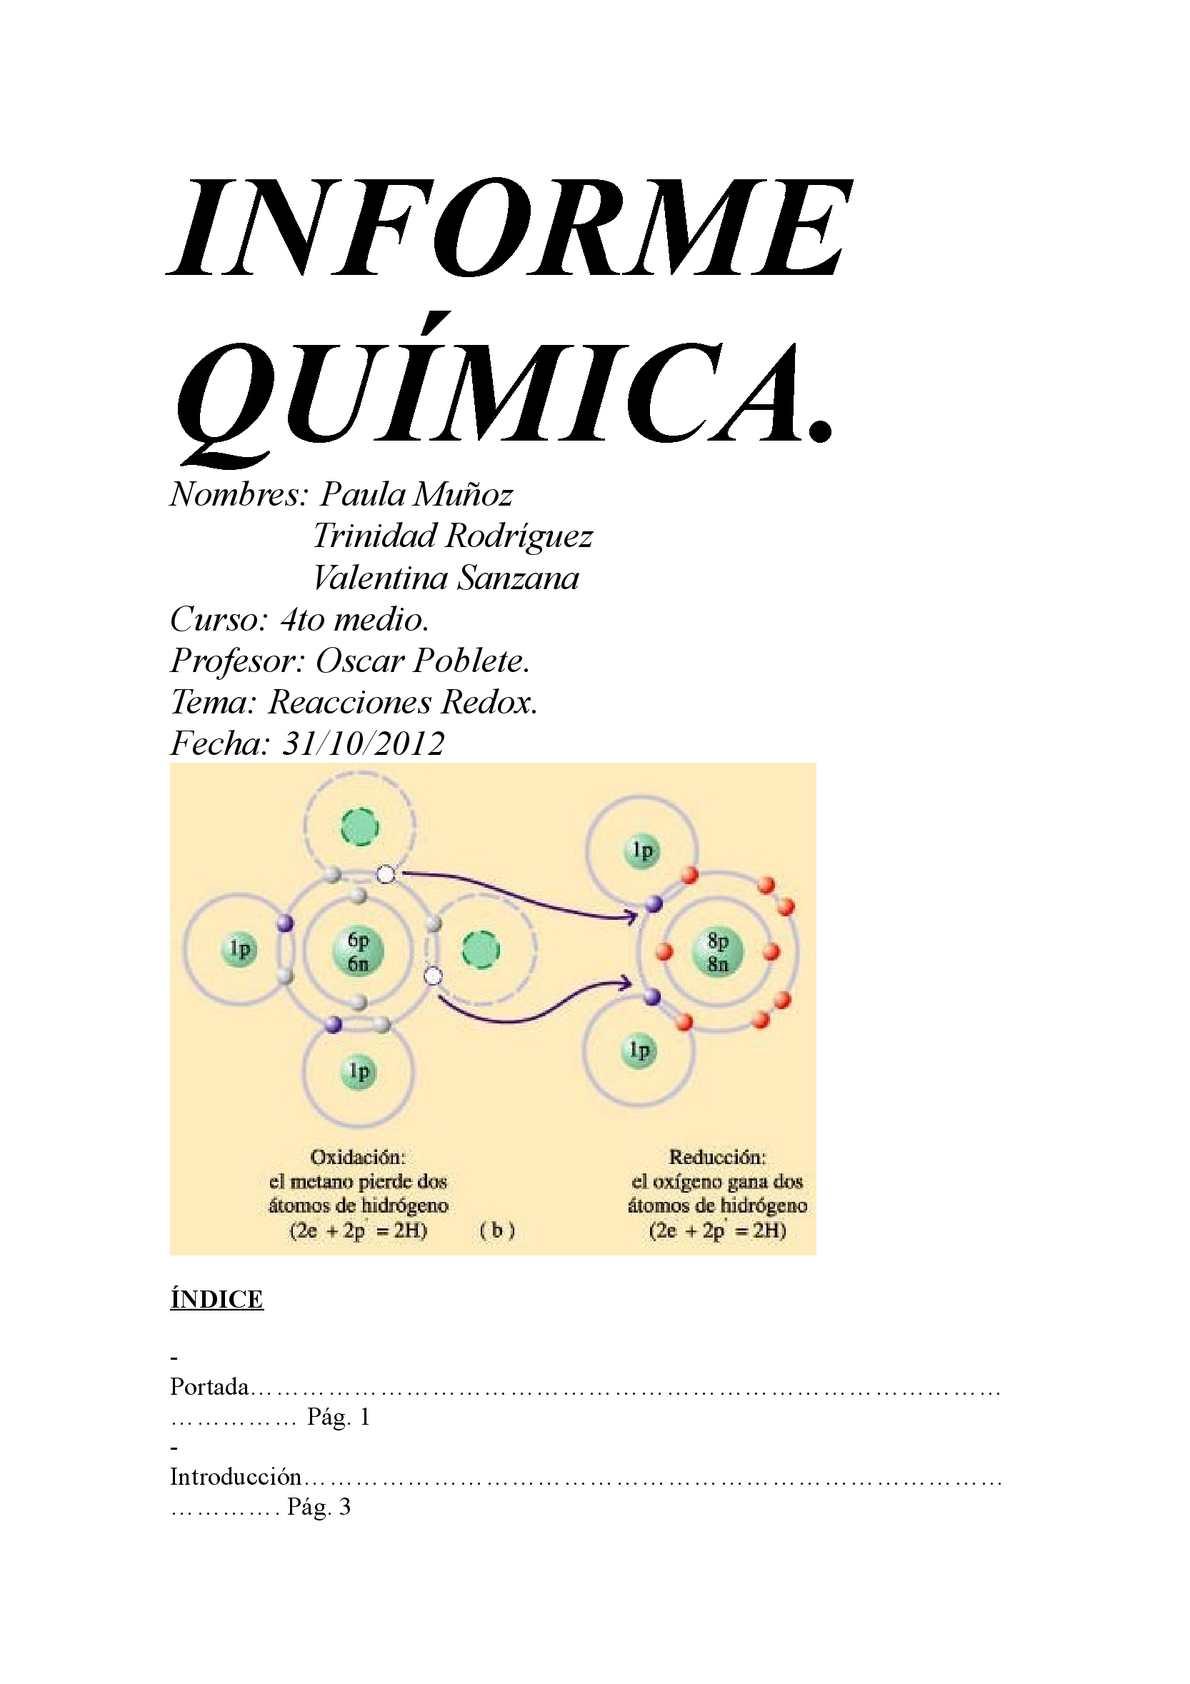 Informe Laboratorio Paula Muñoz